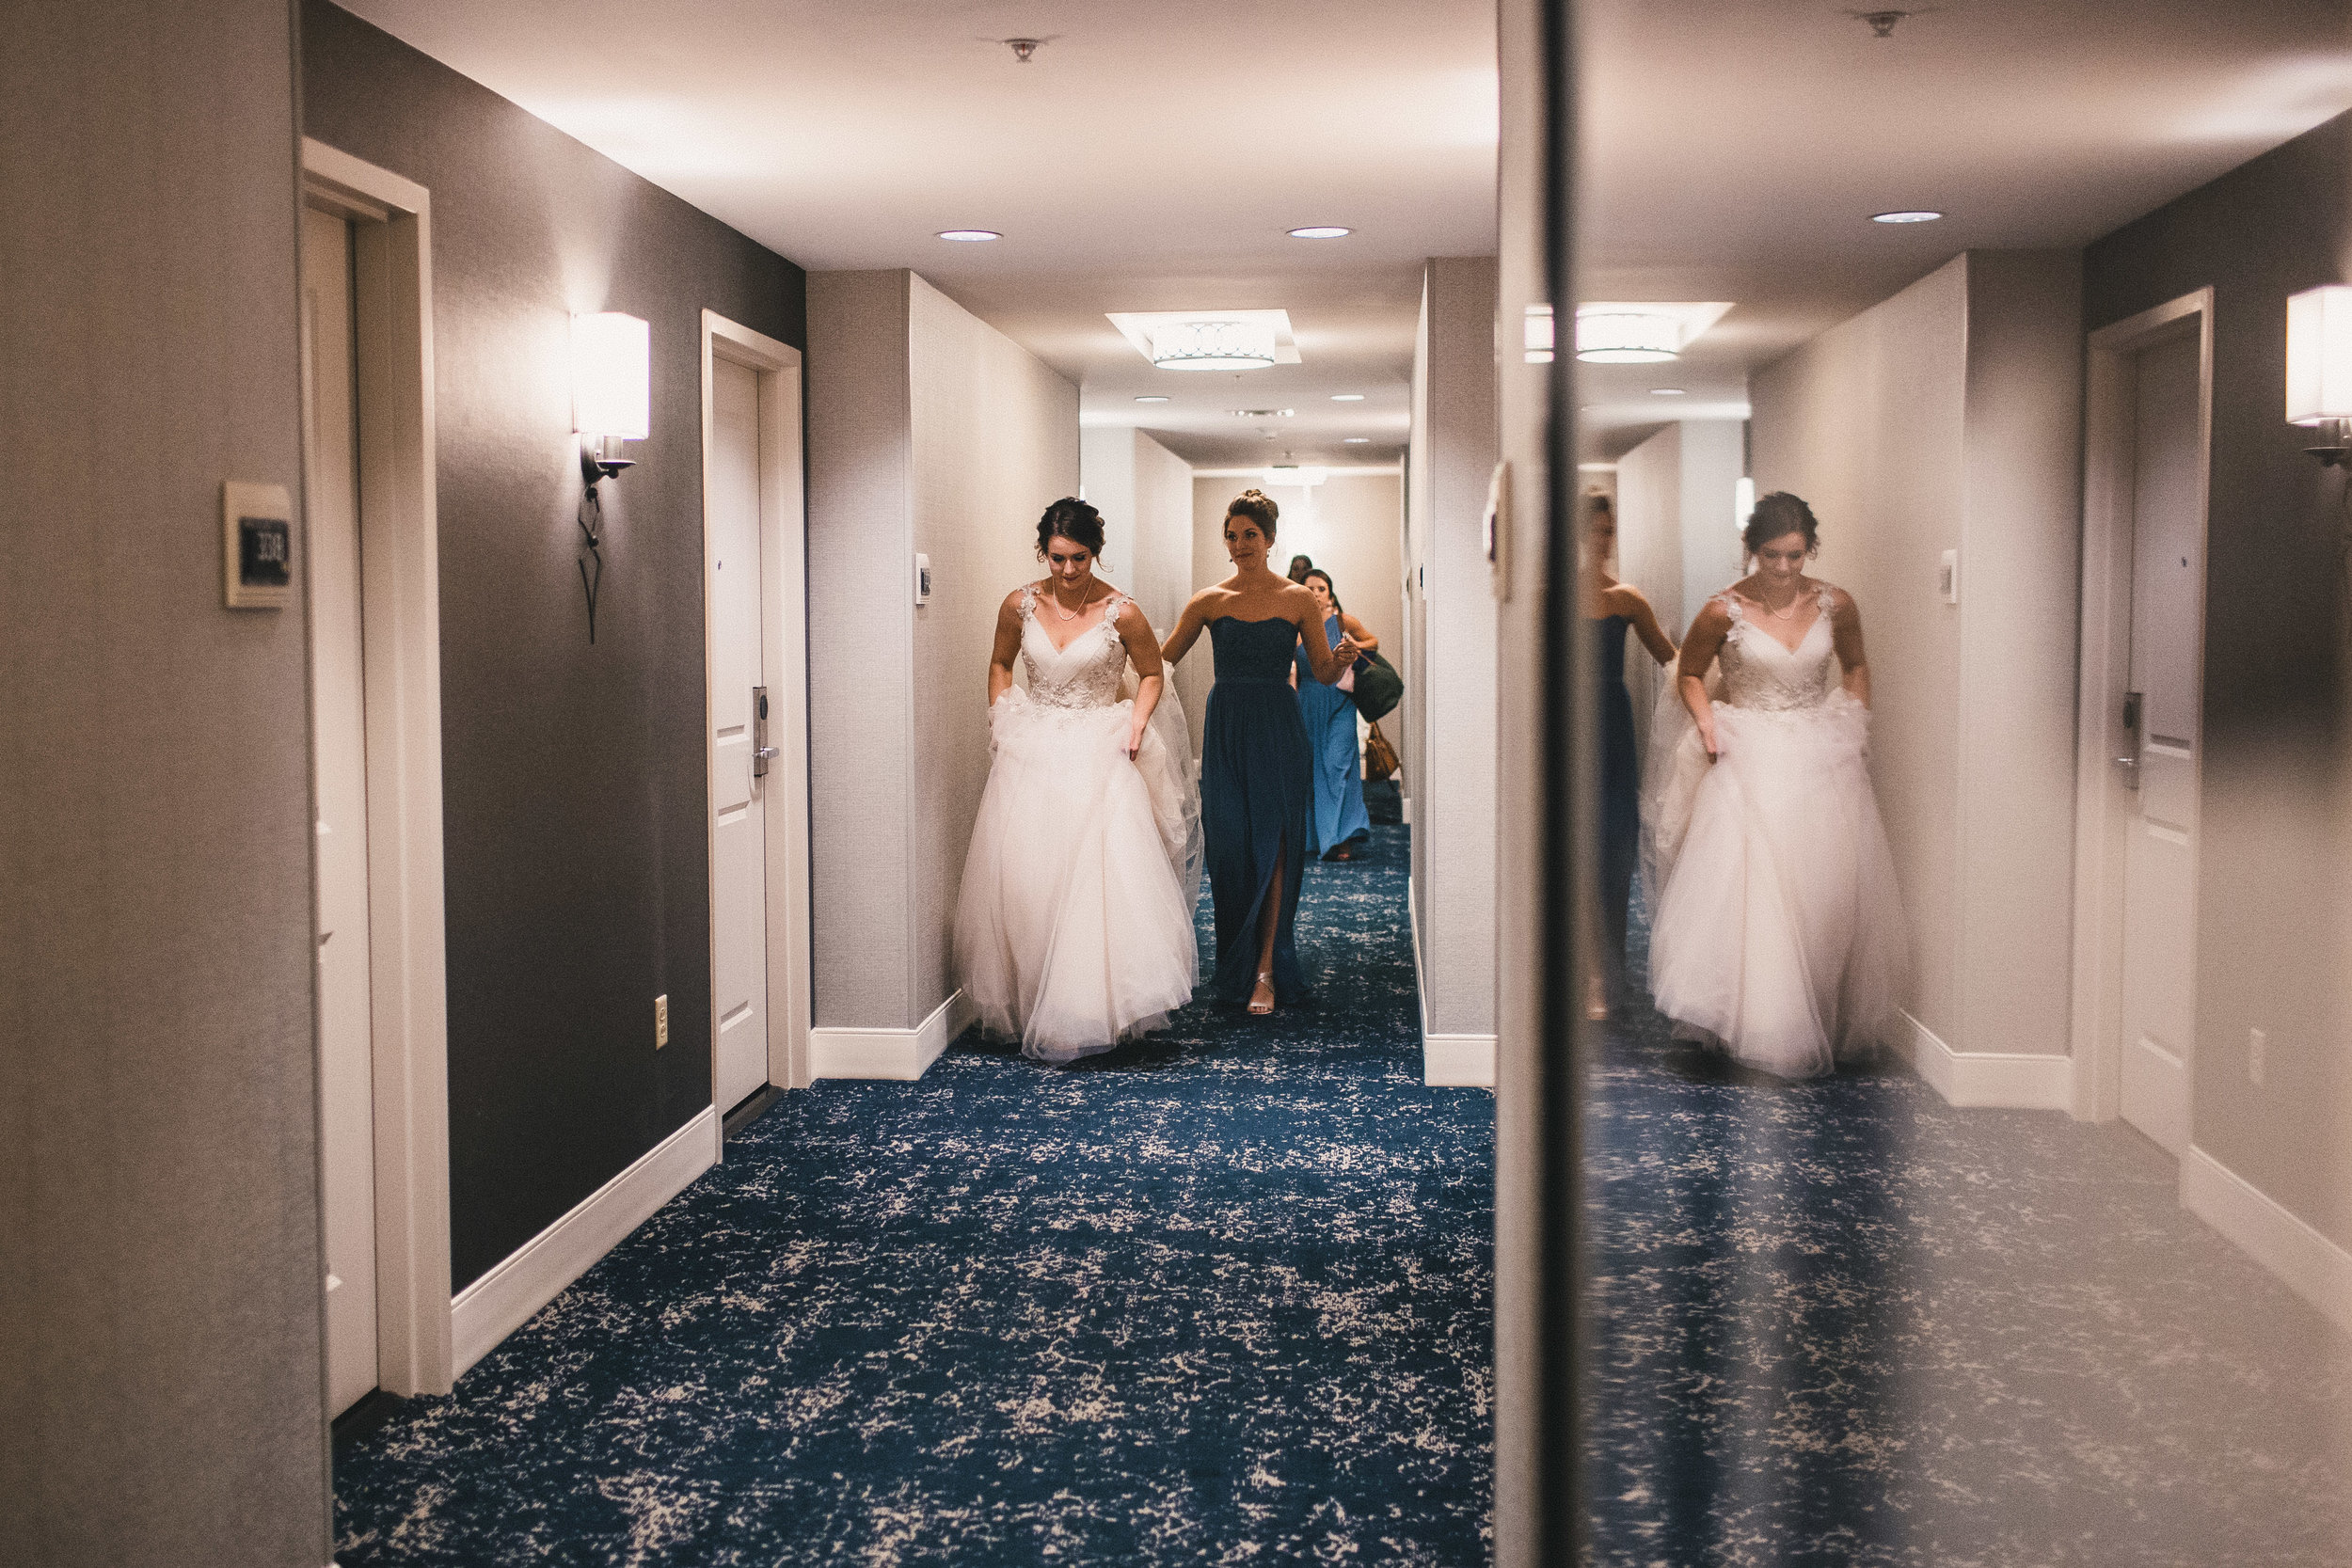 Lindsey & Bert - Wedding 4.1.17-242.jpg